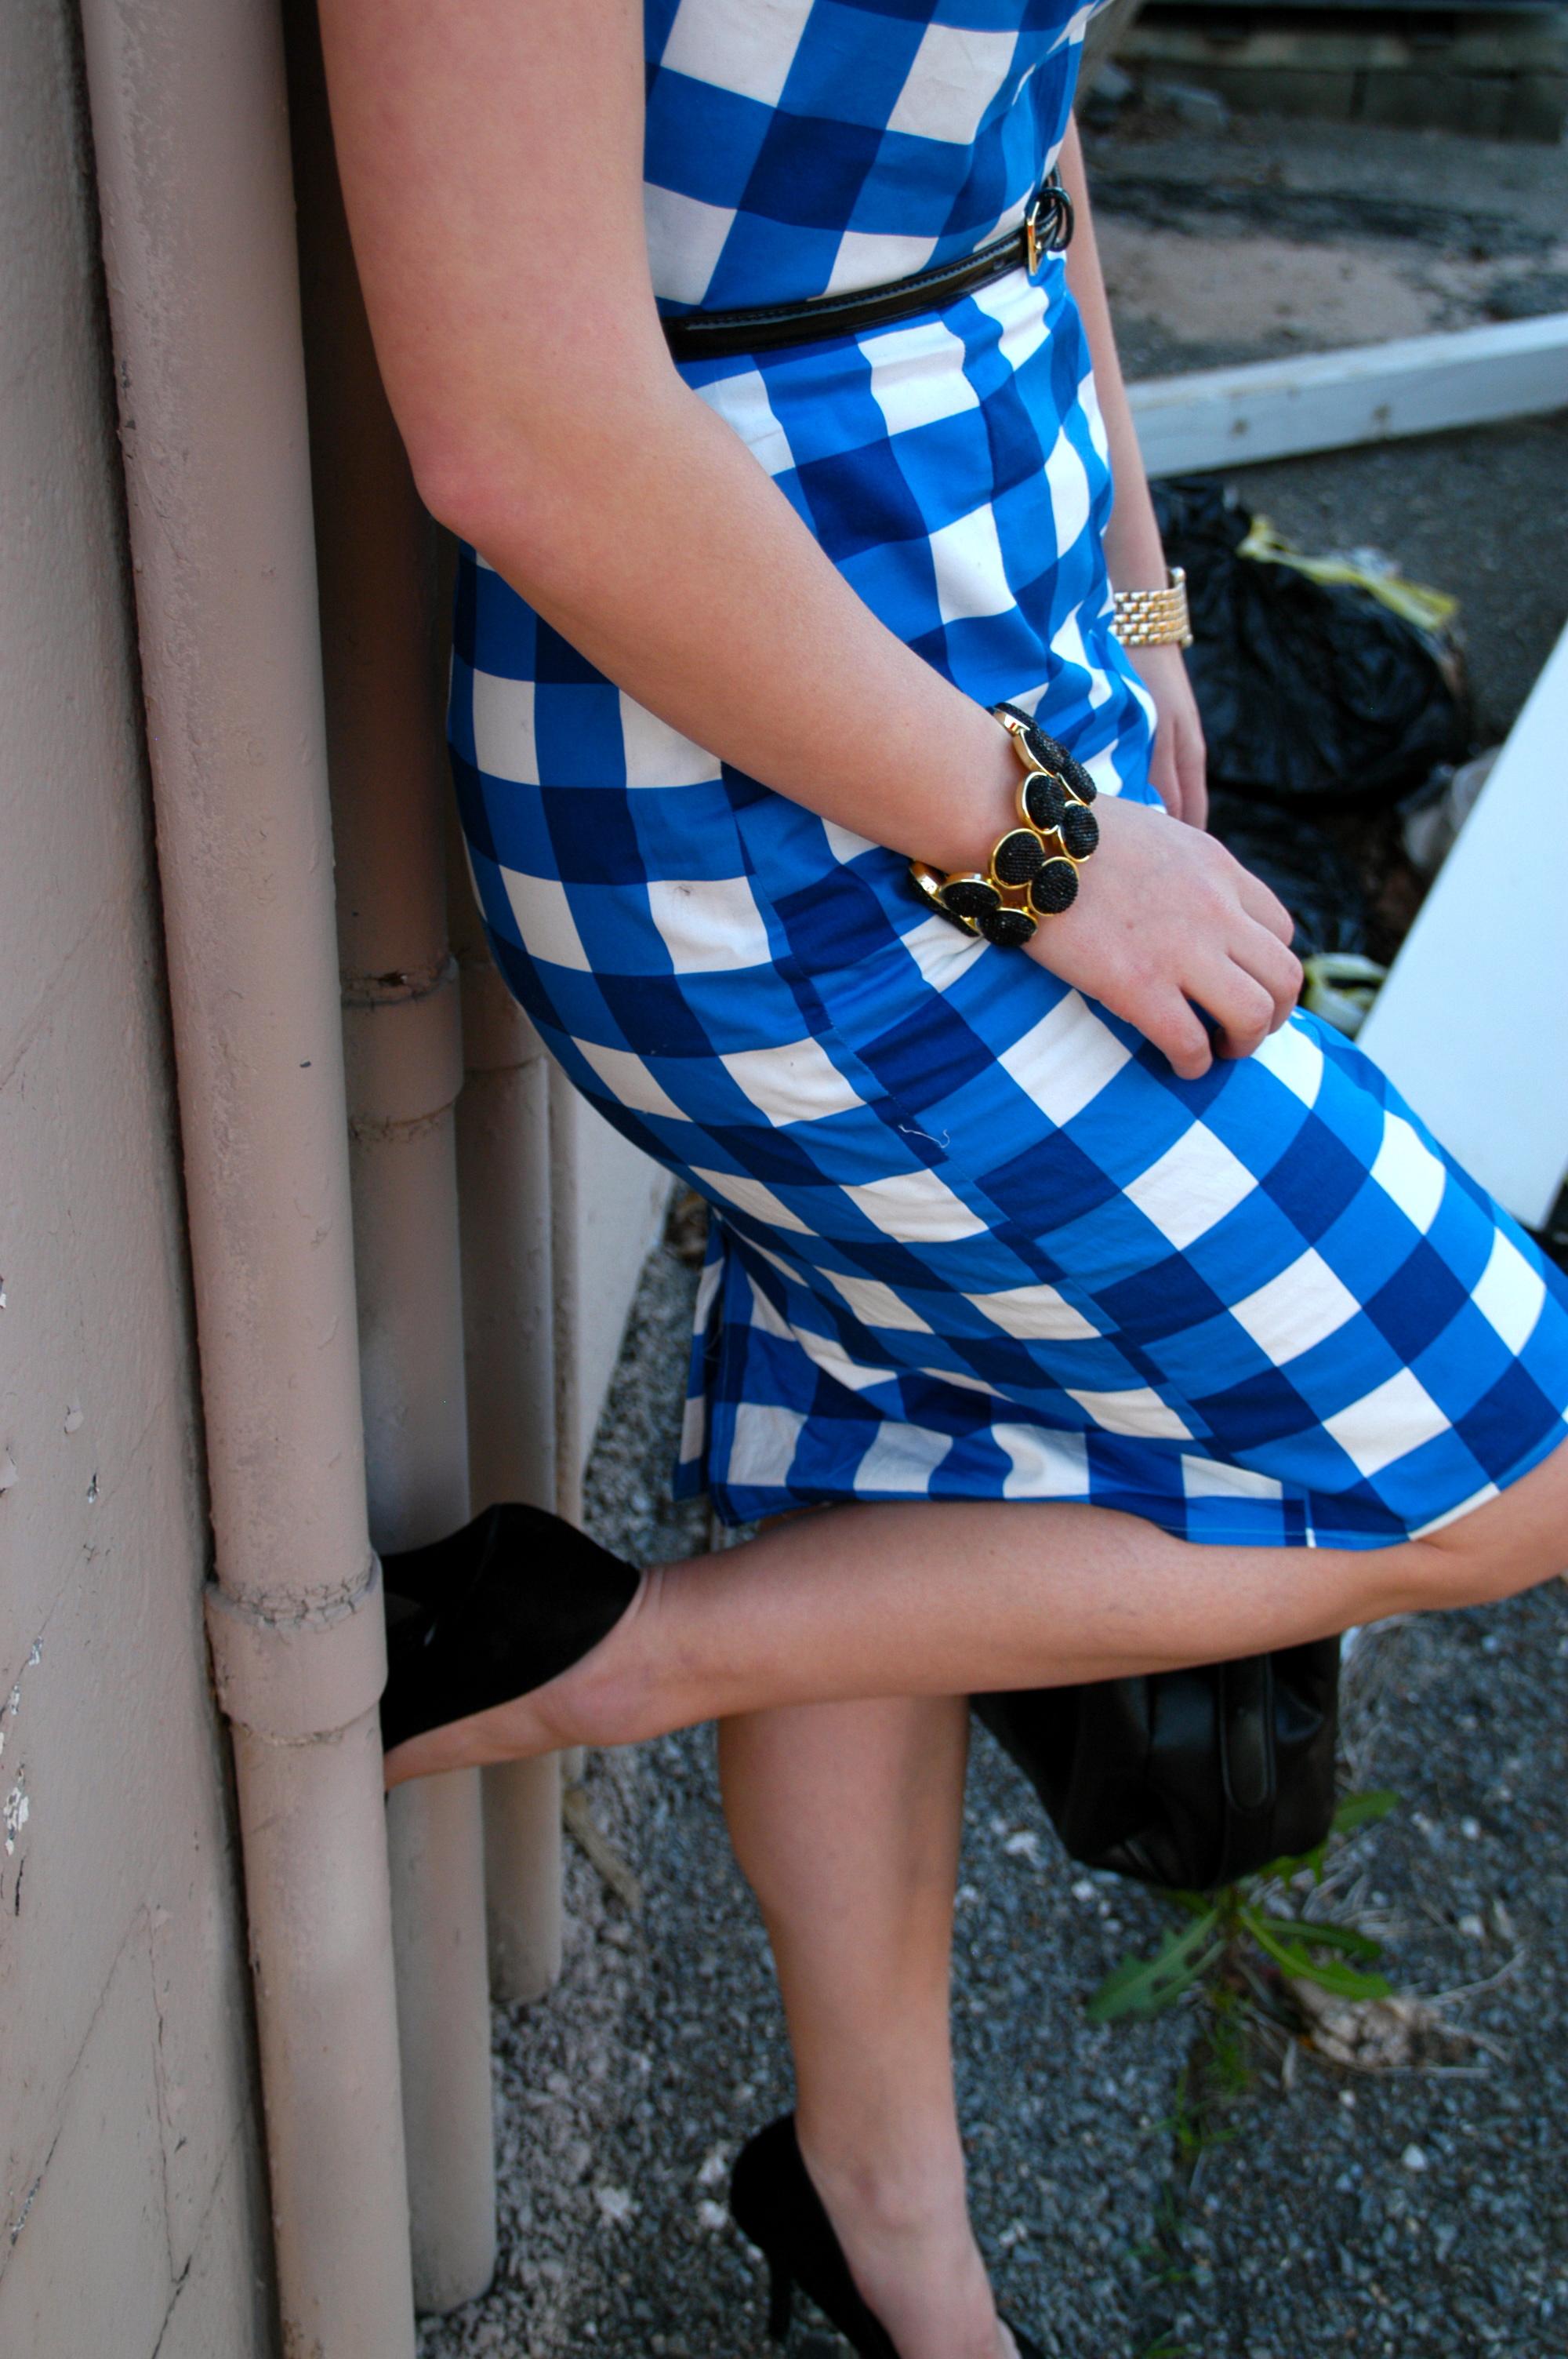 Dress: Handmade - New Look Pattern #6184 | Jacket: H&M | Shoes: Dolce Vita | Purse: Target | Belt: Target | Jewelry: Charming Charlie, Belk | Glasses: H&M